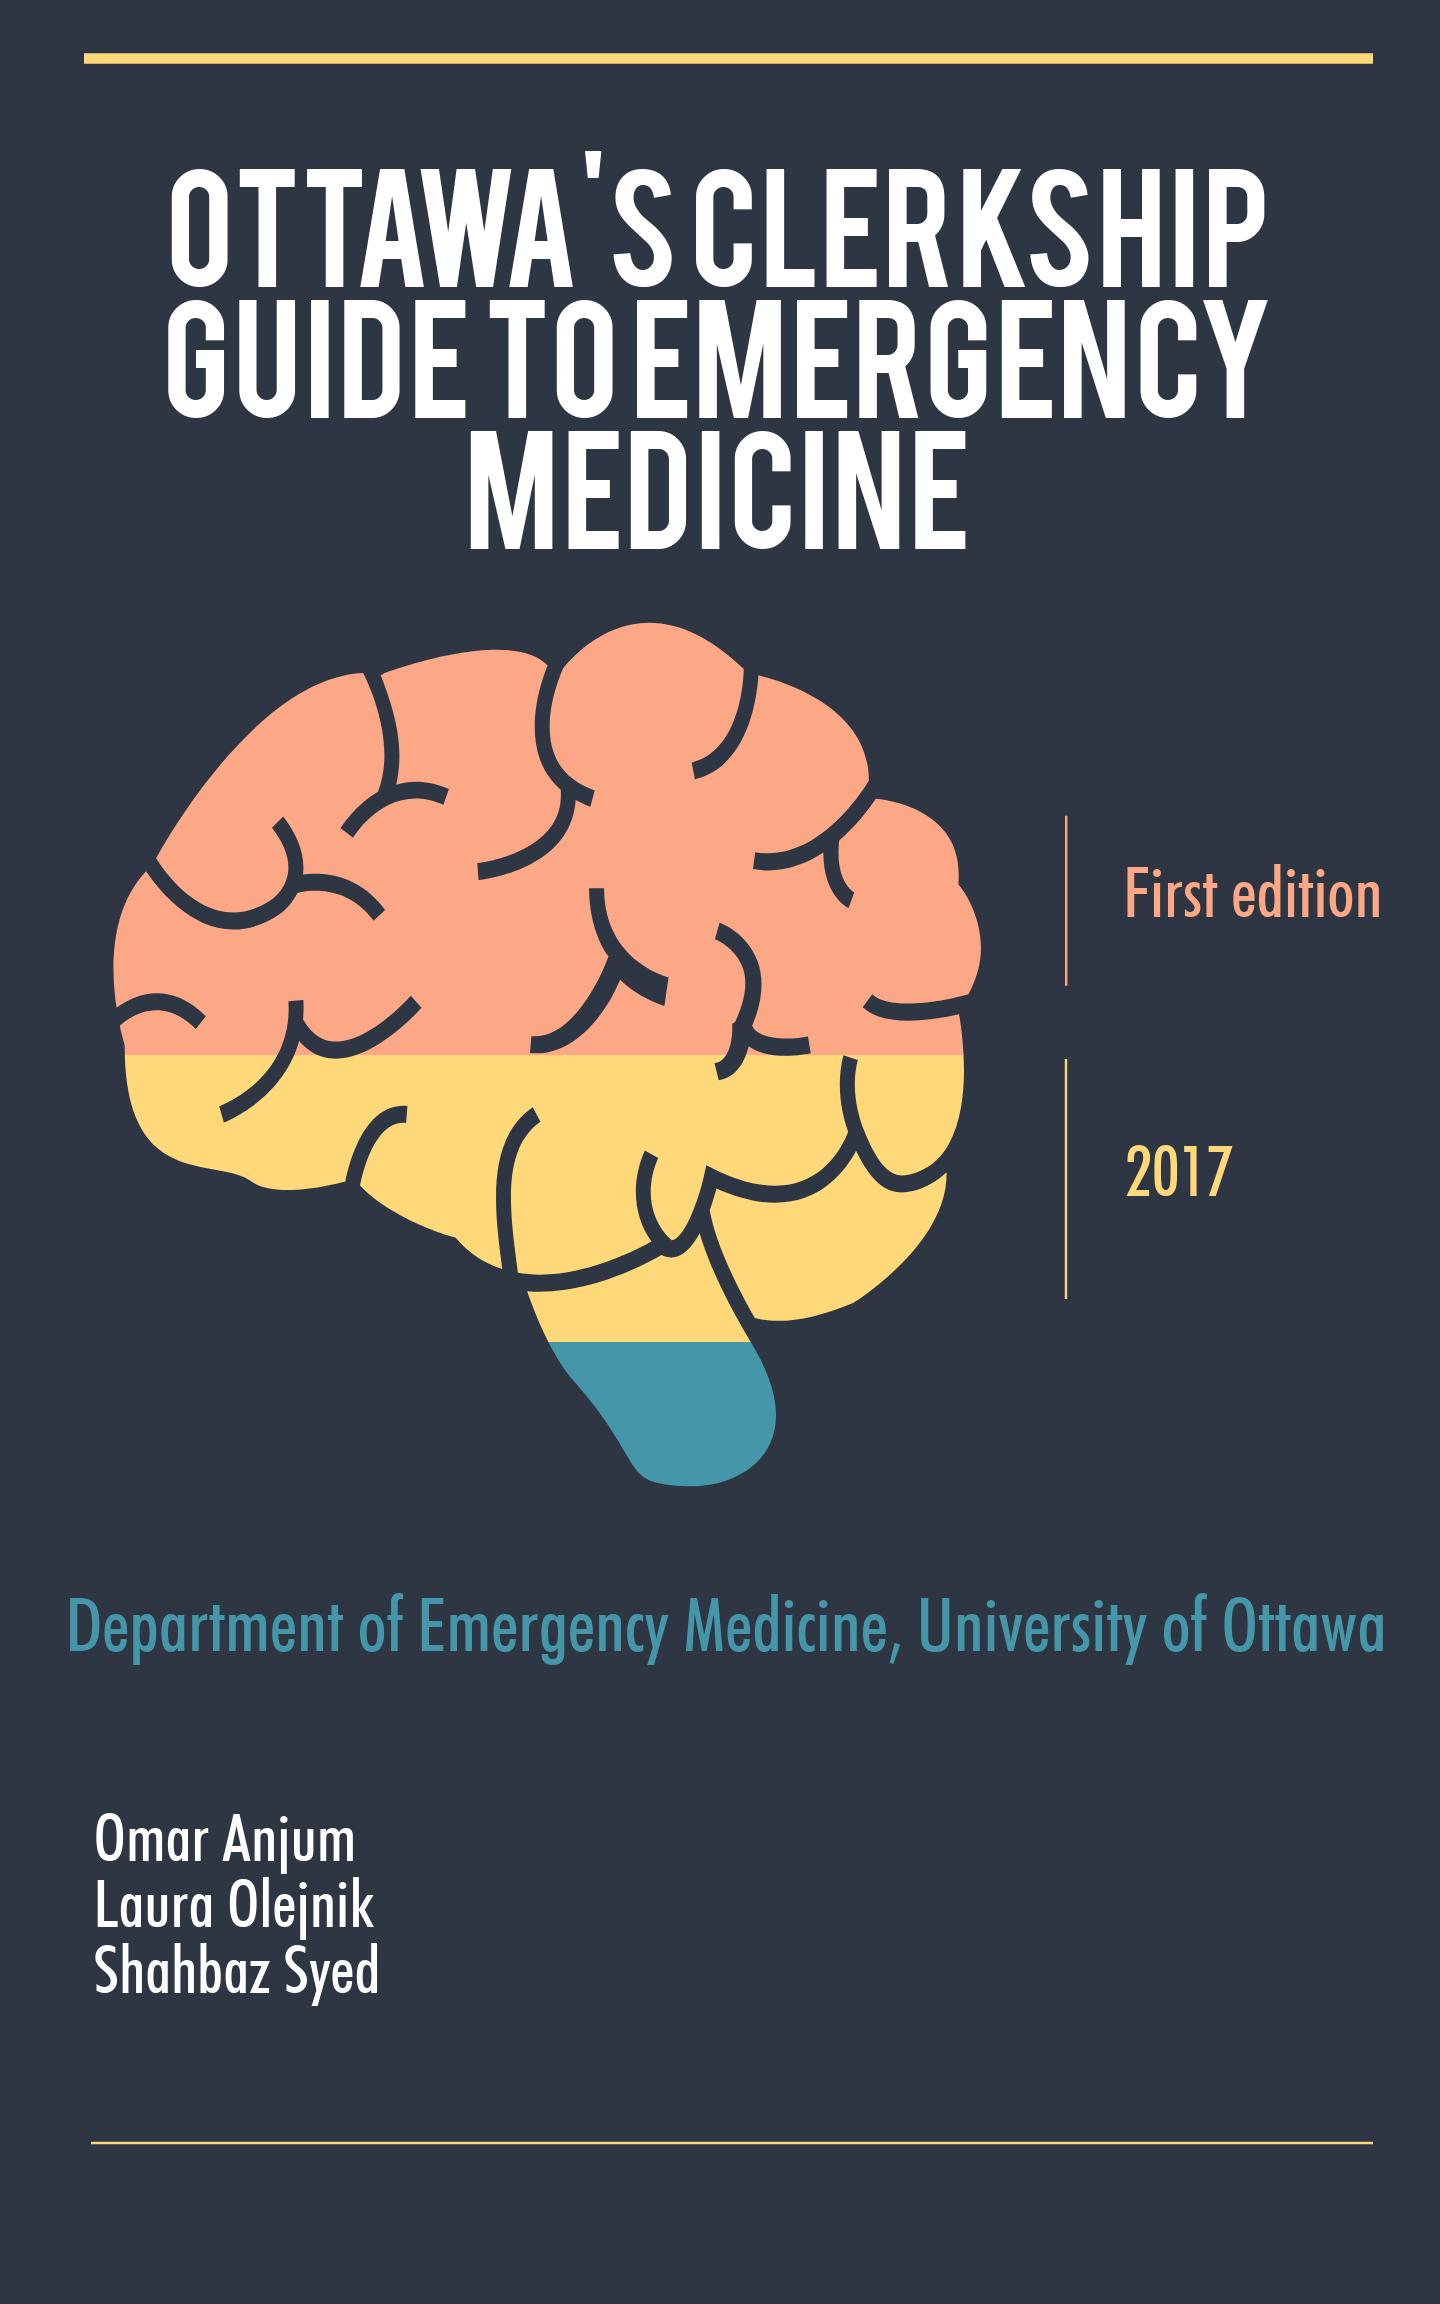 Ottawa's Clerkship Guide to Emergency Medicine